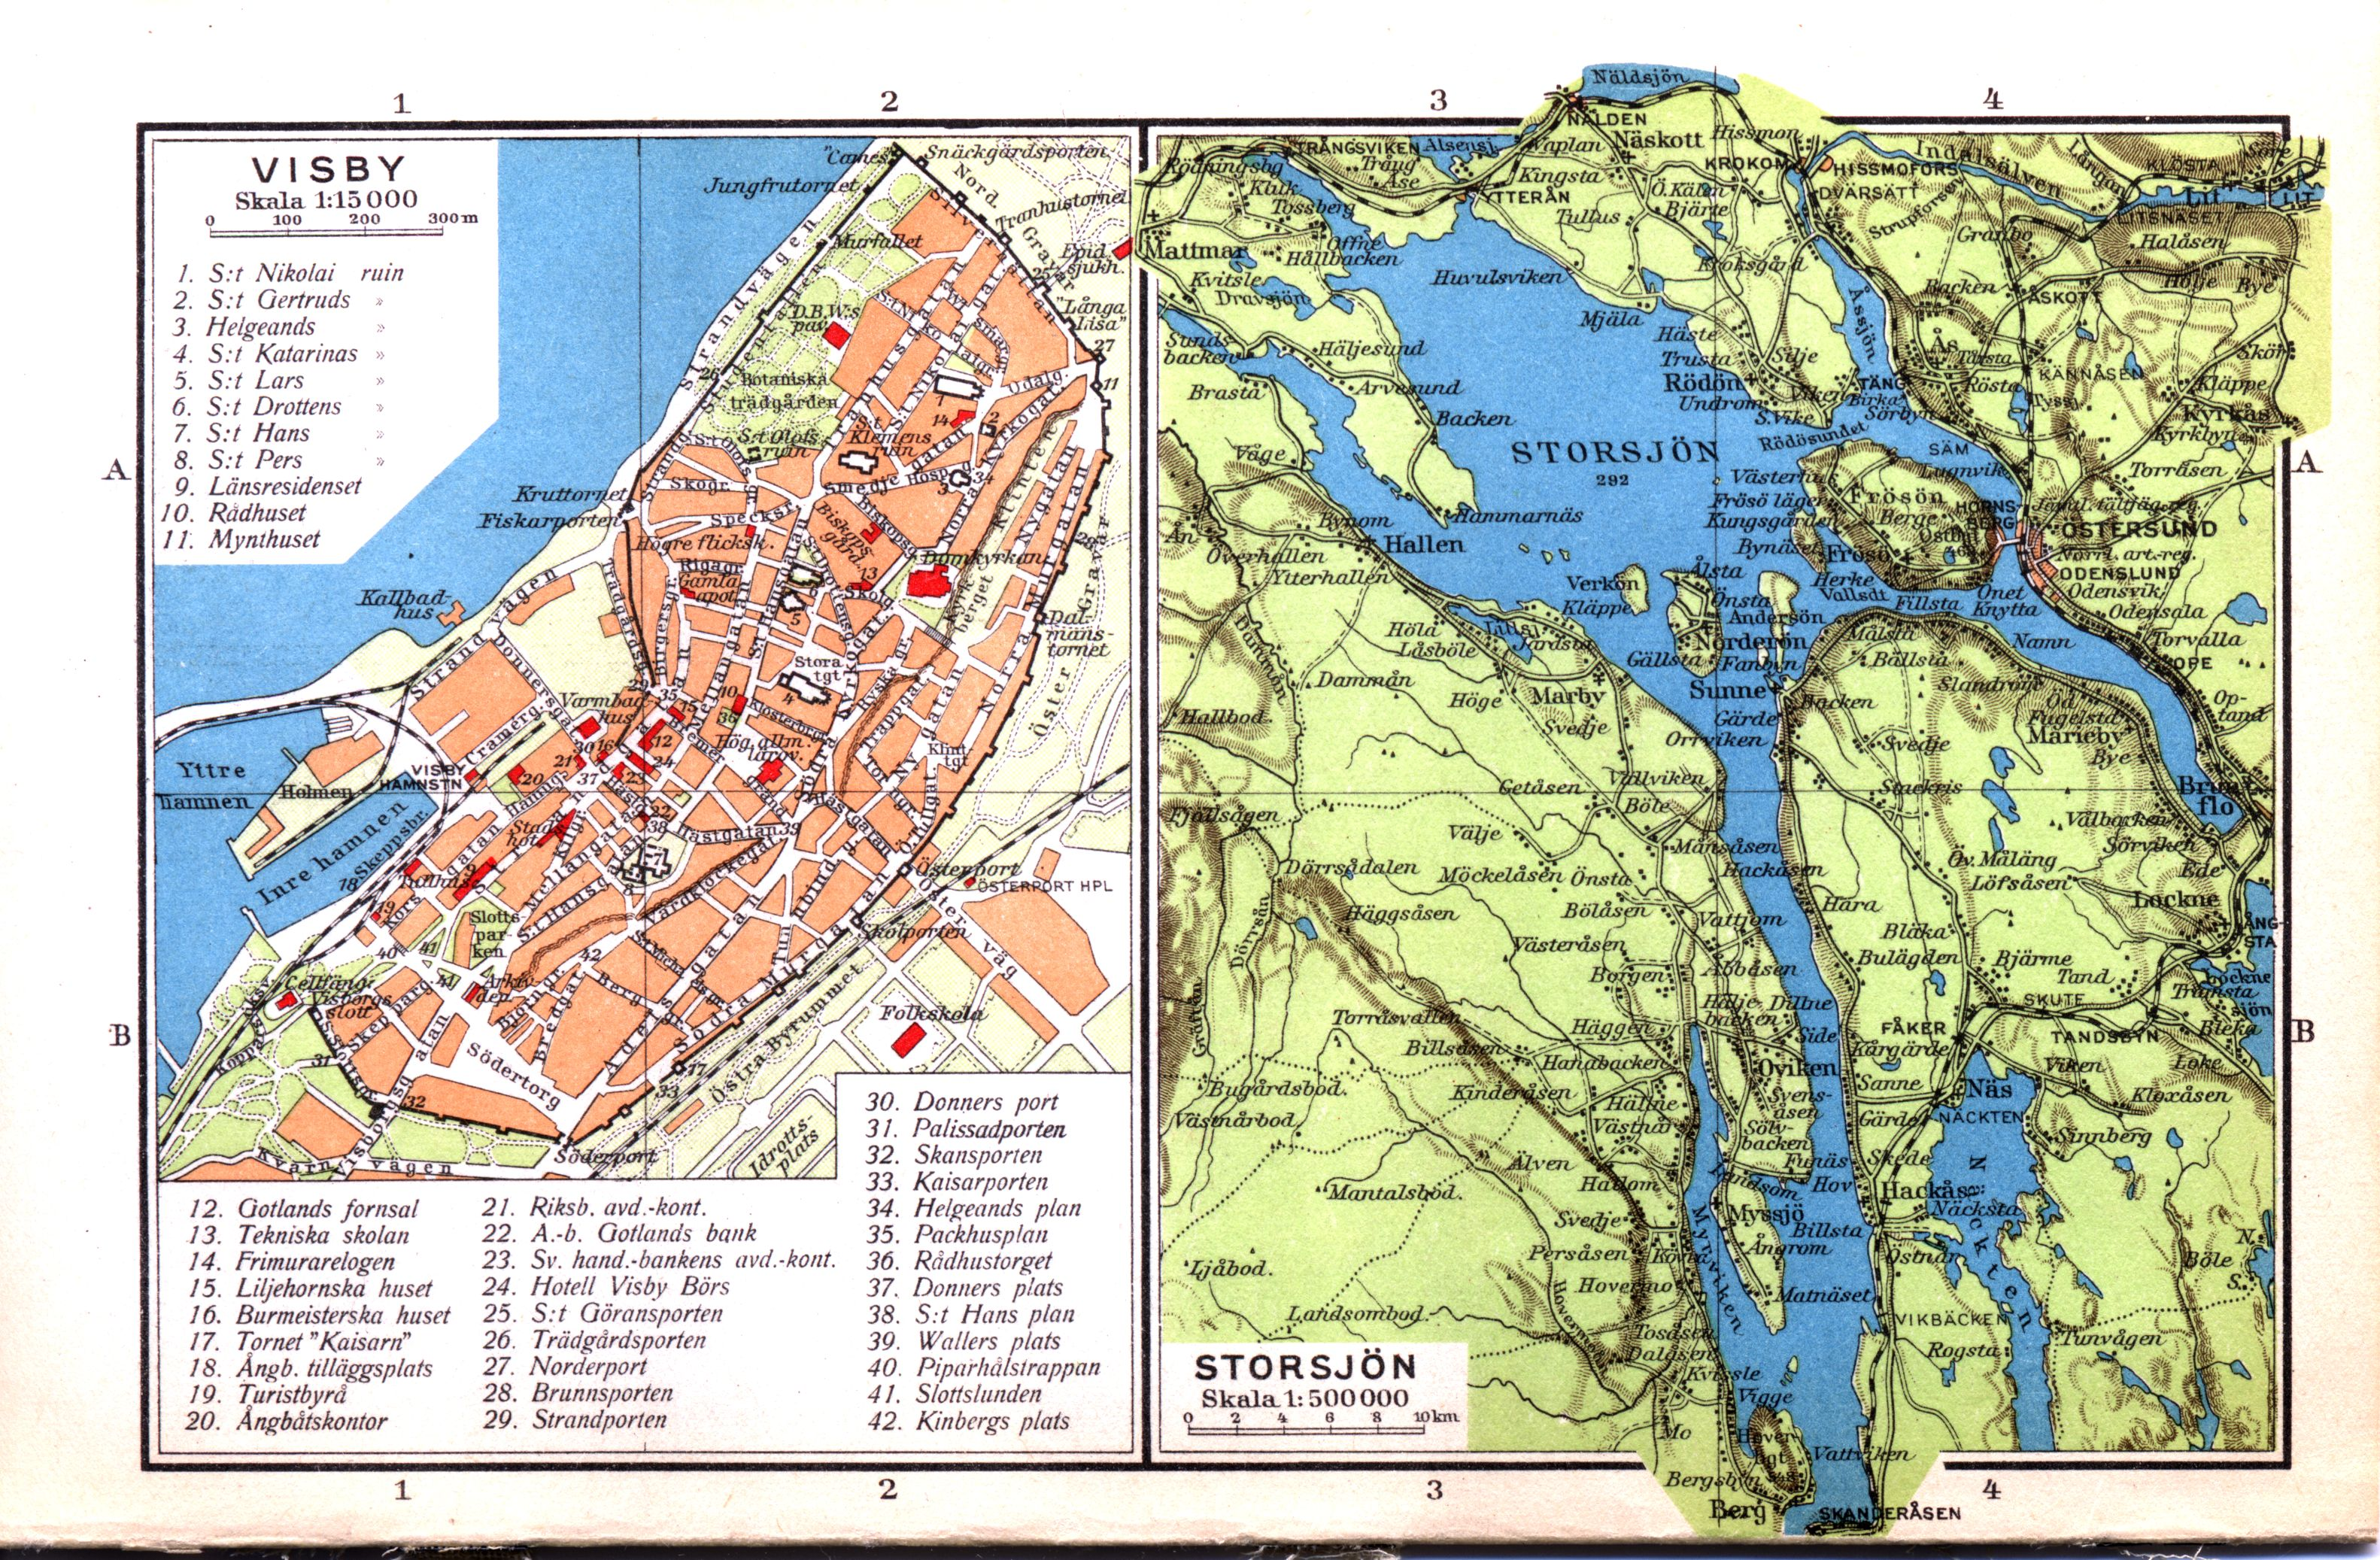 File:Cohrs atlas över Sverige 0029 Visby Storsjön.jpg - Wikimedia ...